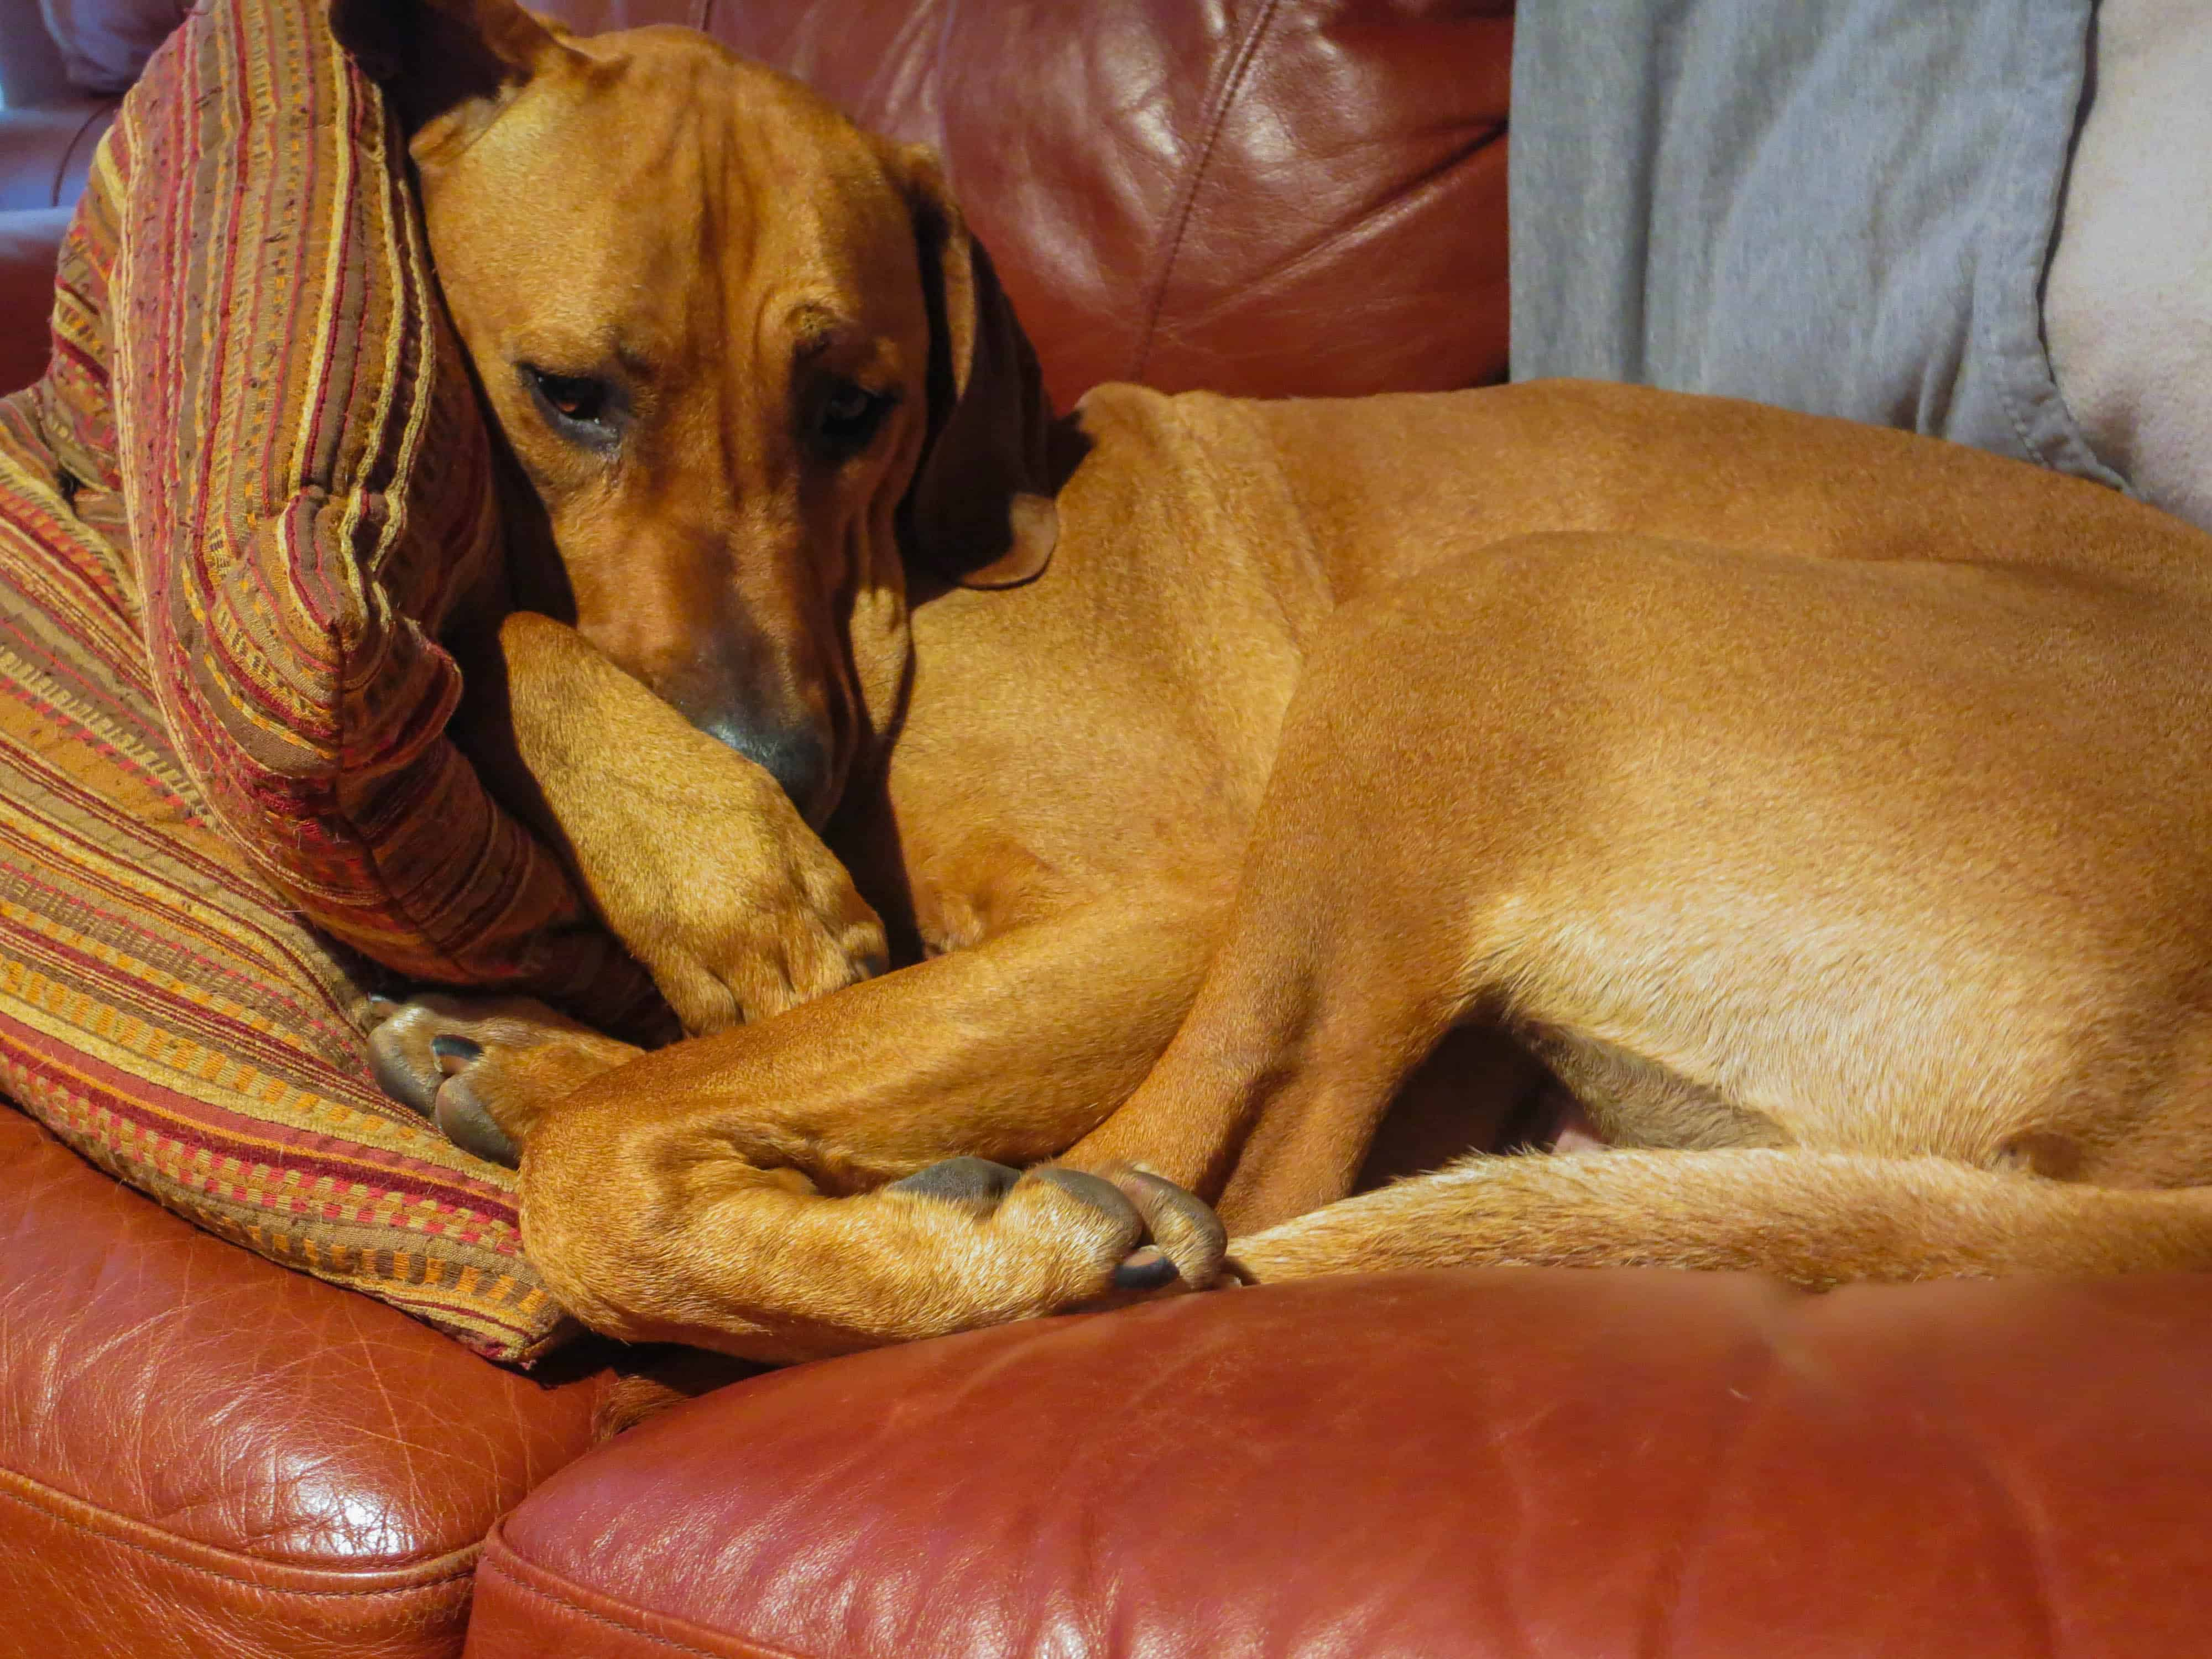 Rhodesian Ridgeback, pet adventure, dog blog, pet photos, Rhodesian Ridgeback photo